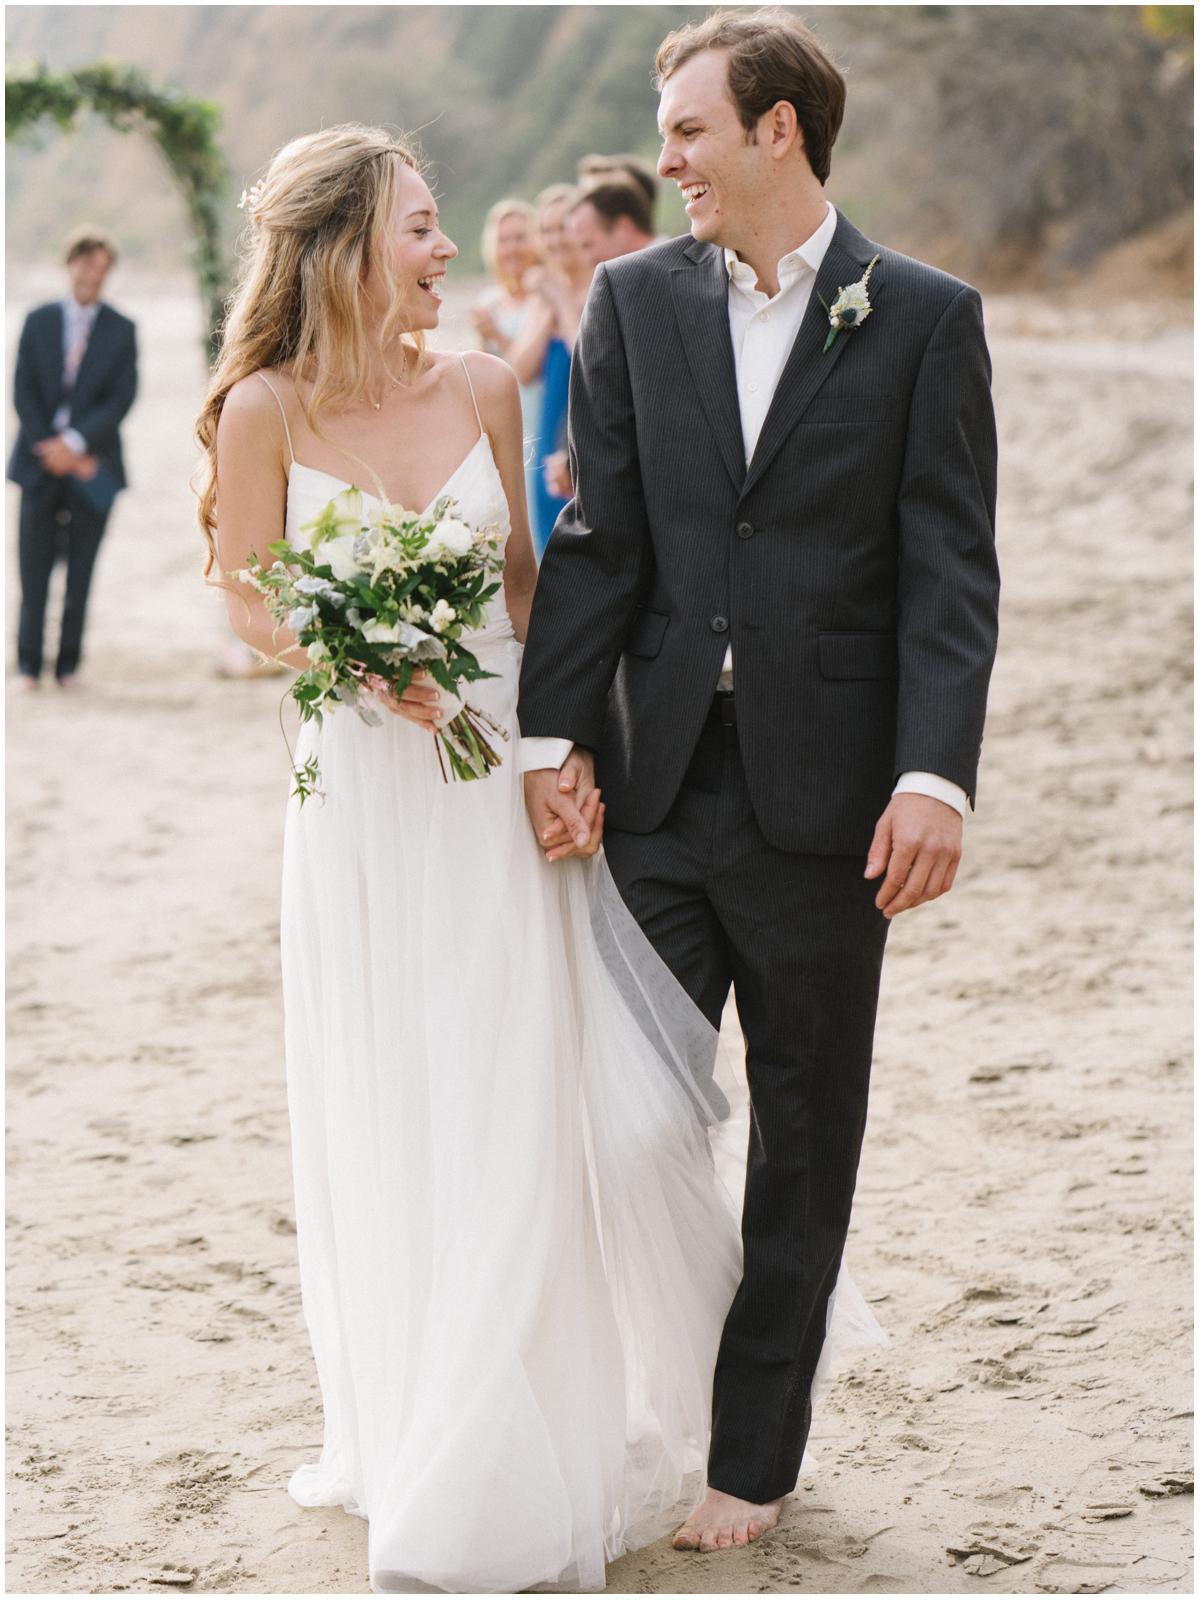 Santa Babara Elopement Wedding Photographer - Pinnel Photography-01-12.jpg